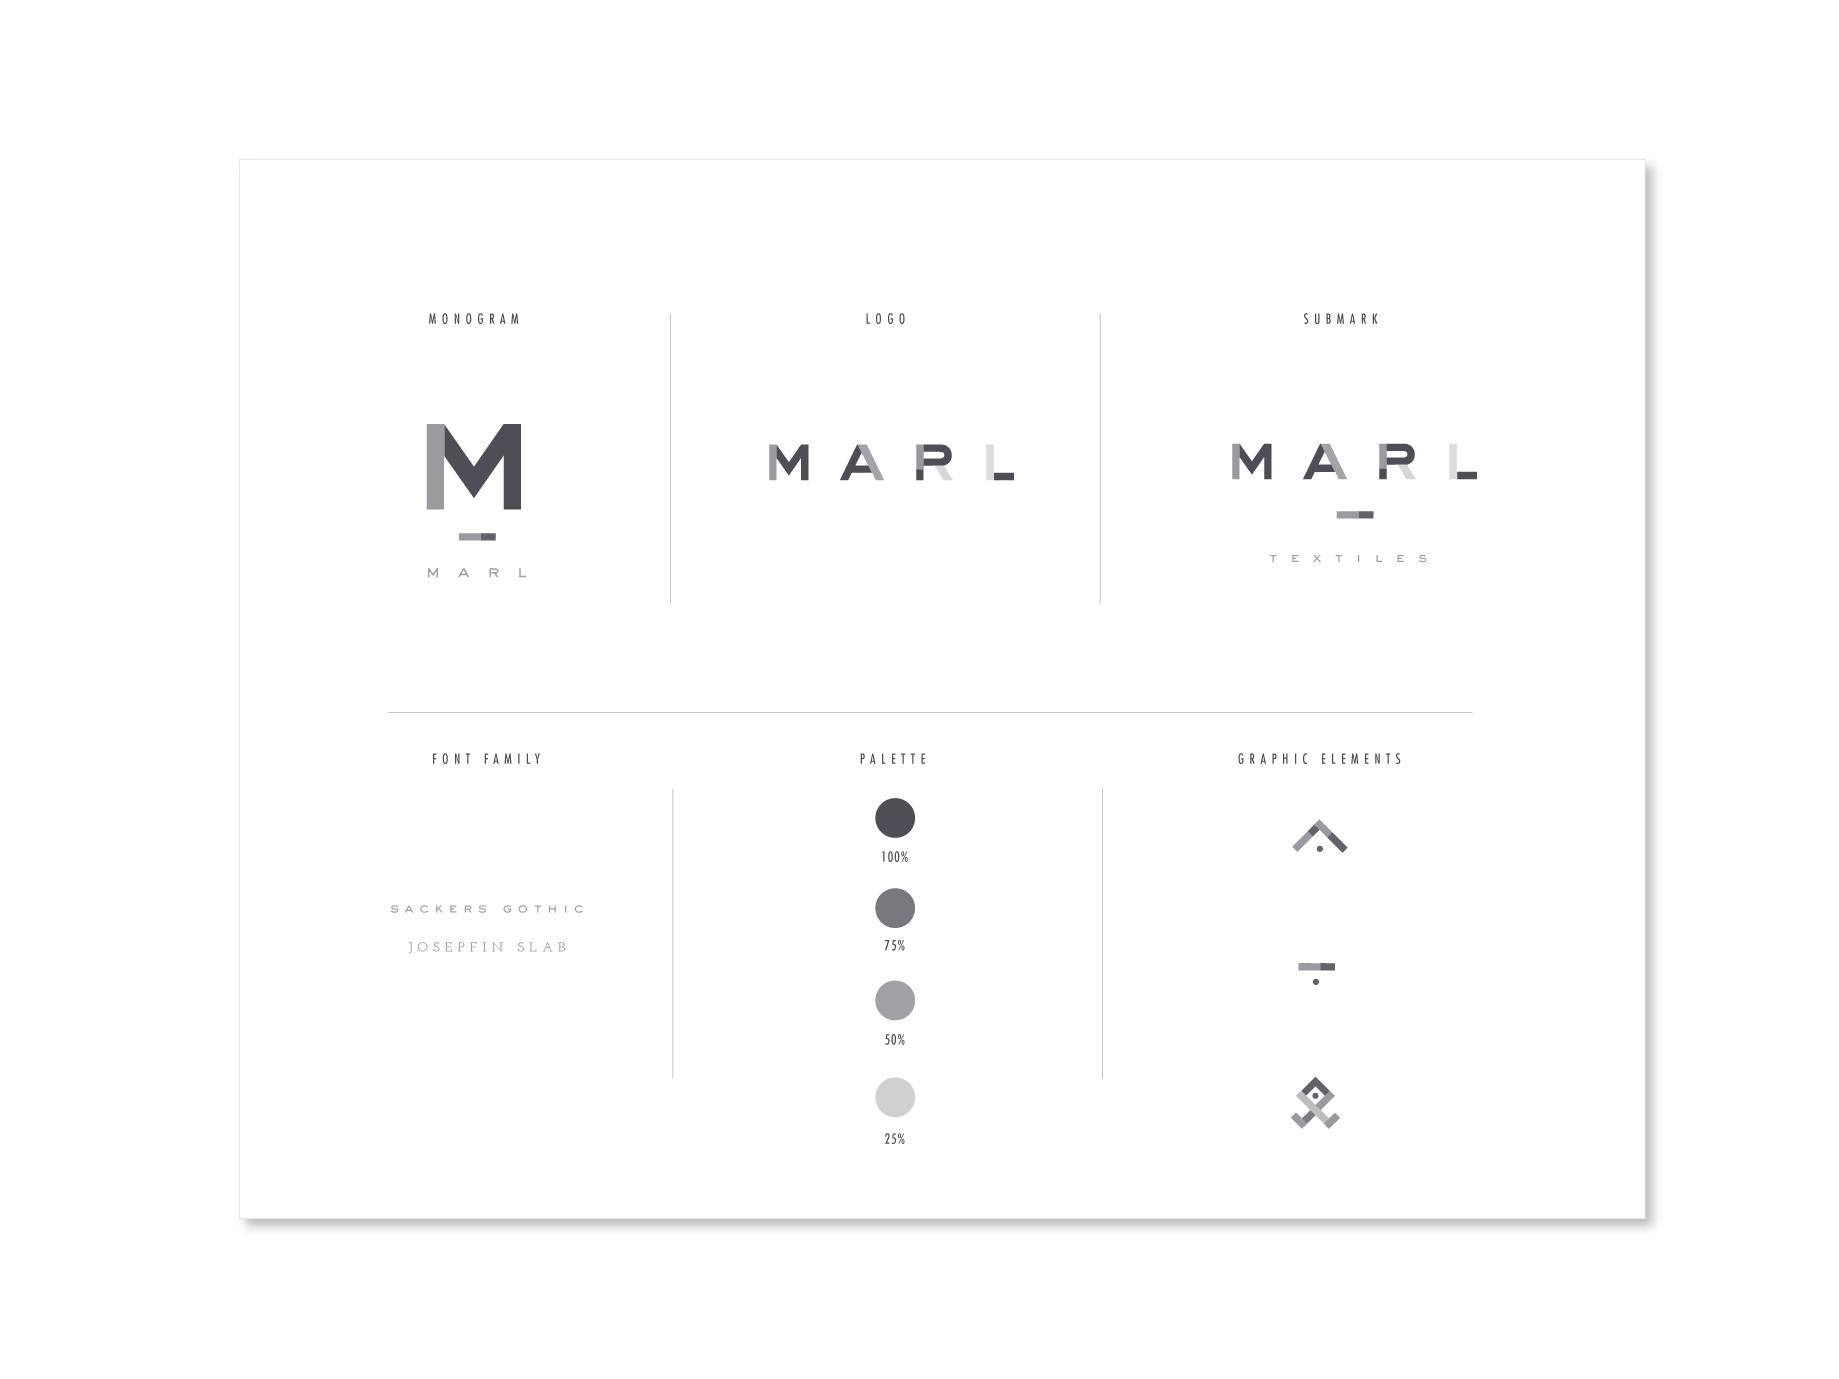 marl_style_sheet